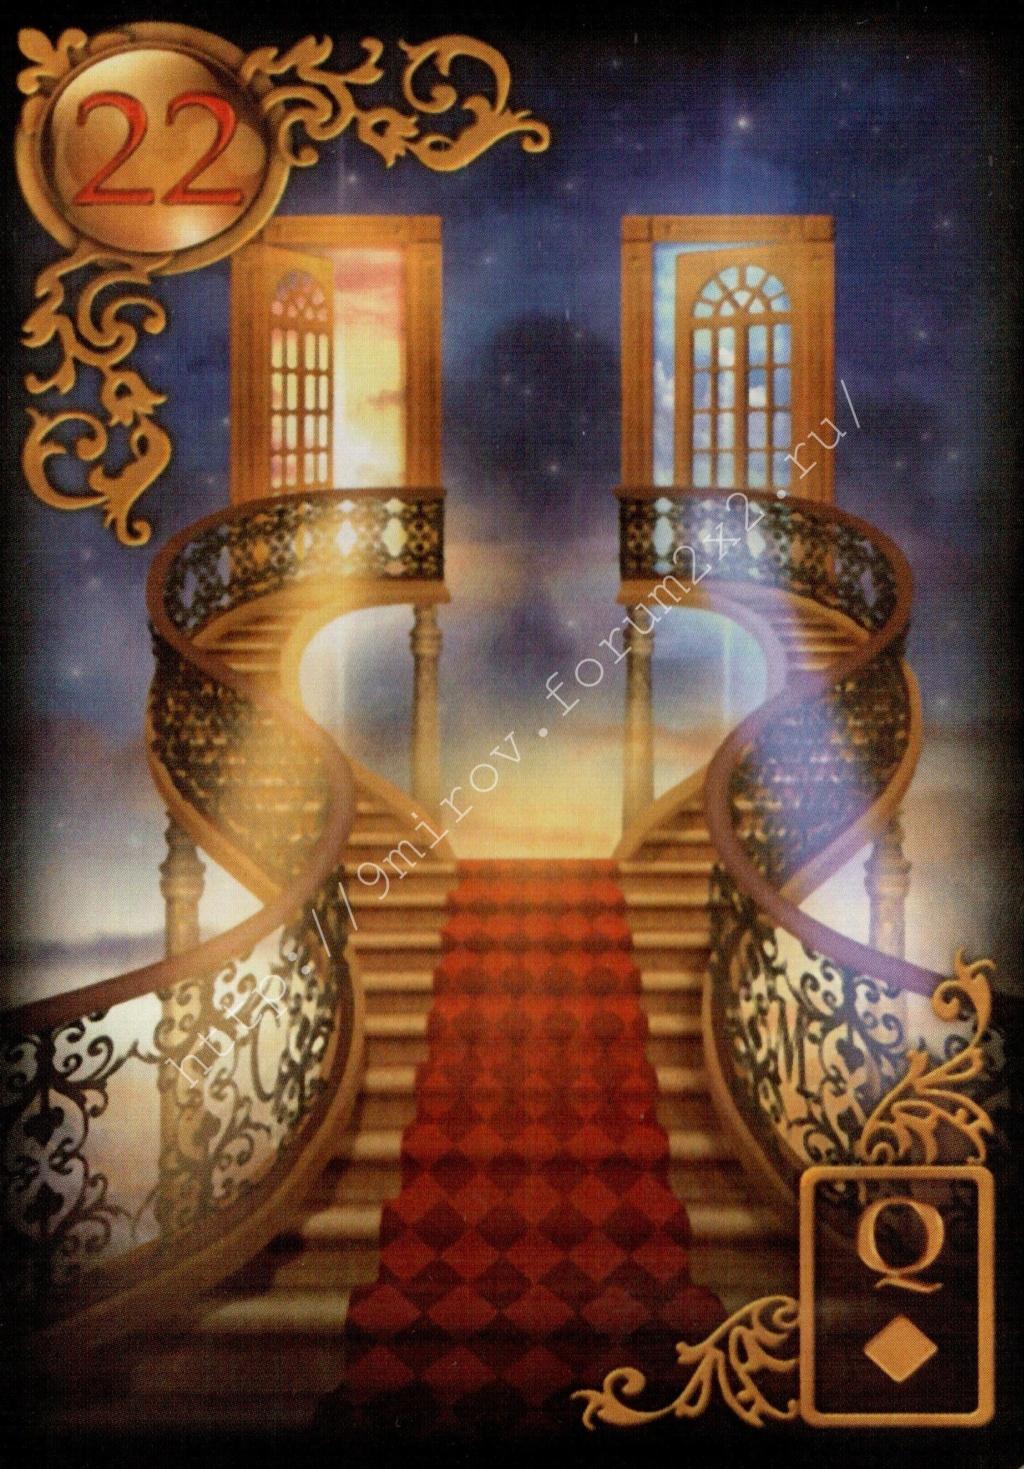 Золотые мечты Ленорман (Расширенное издание) | Gilded Reverie Lenormand. Галерея.  Water115